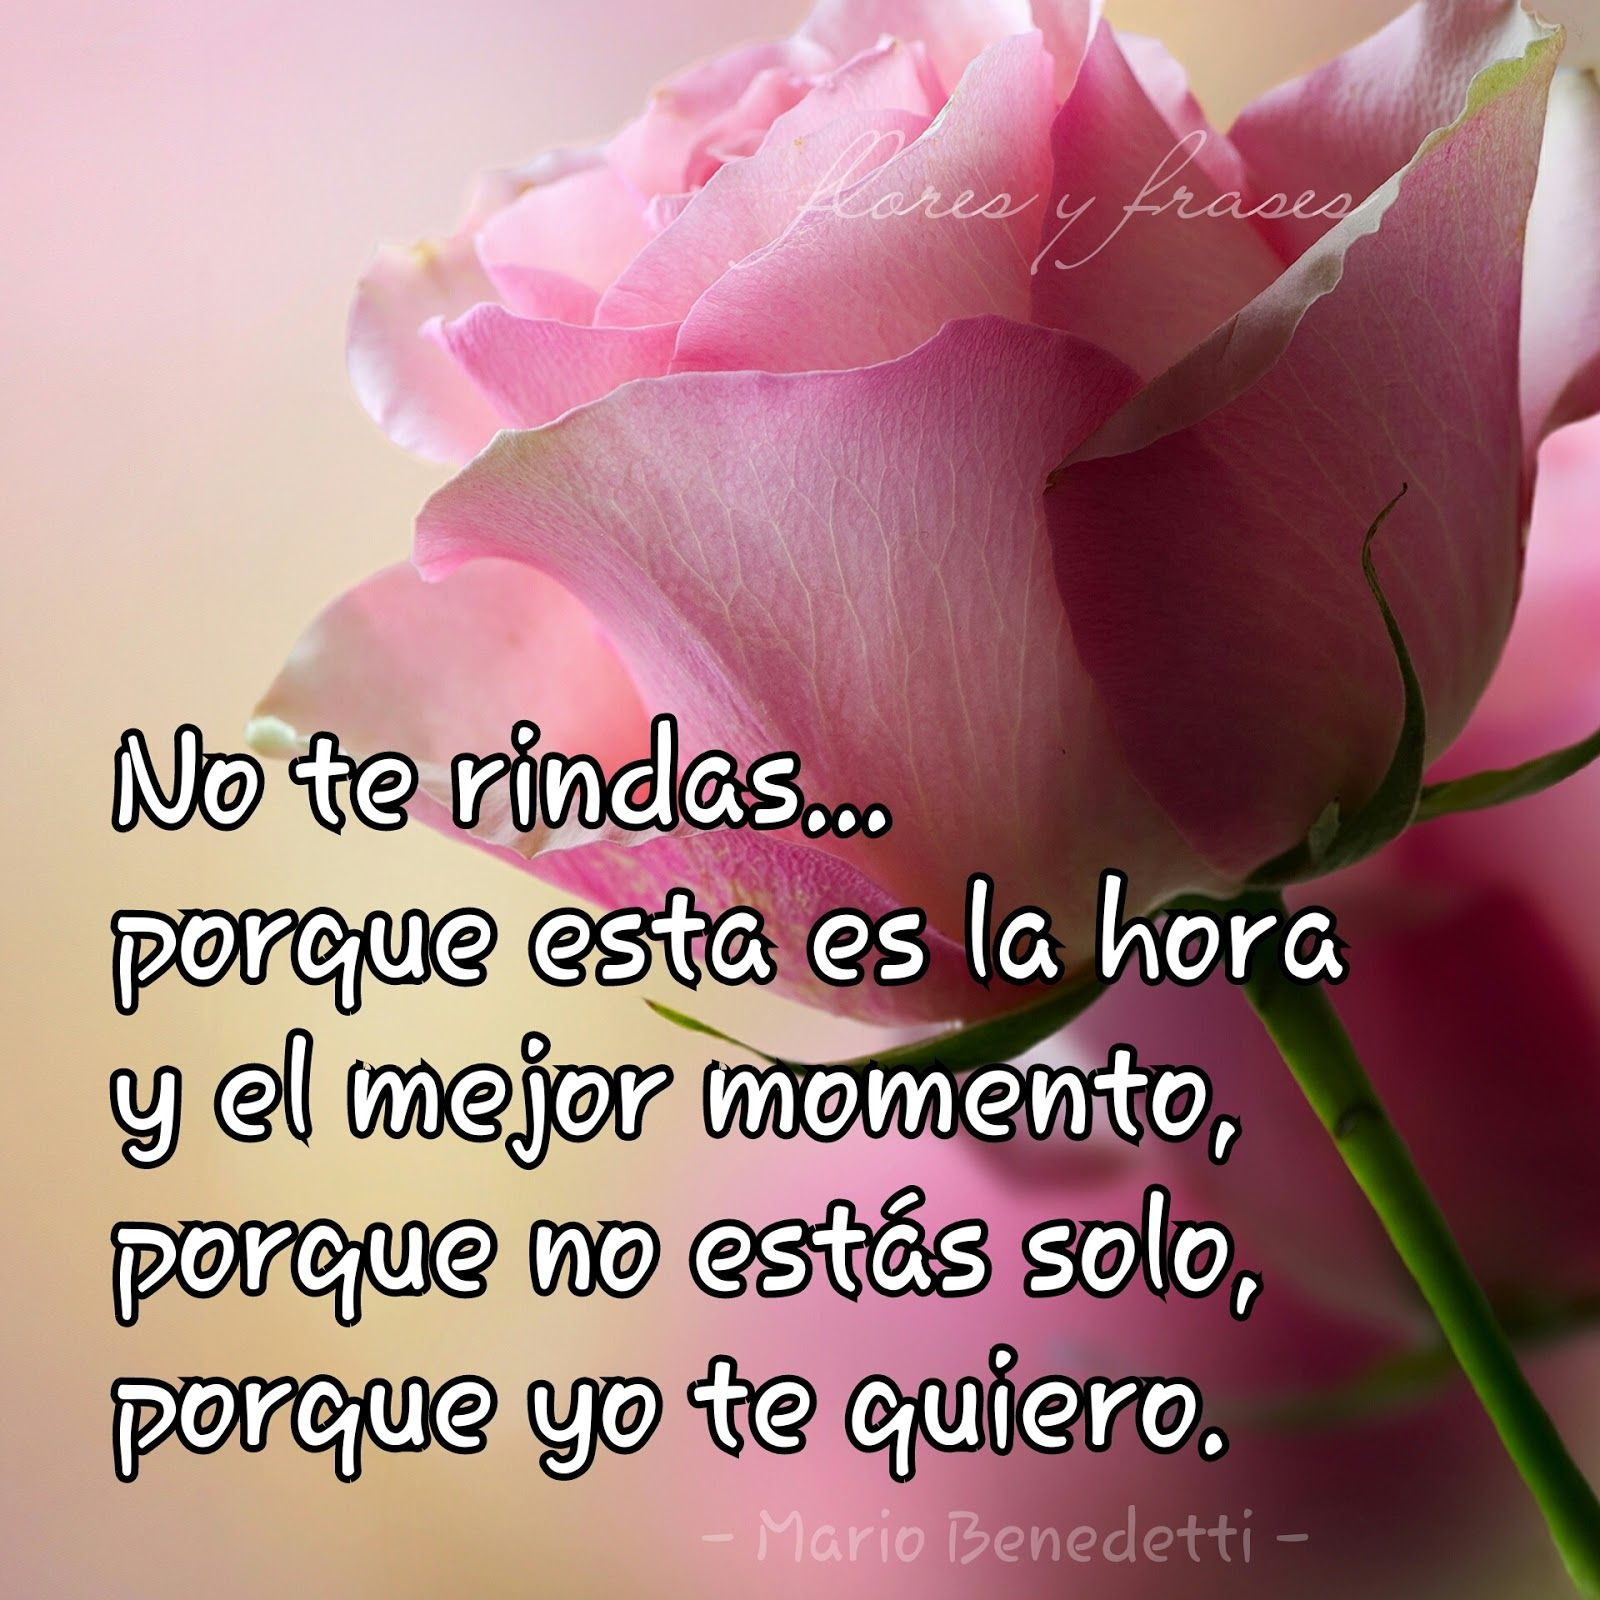 Flores Y Frases Frases De Amor De Mario Benedetti Frases